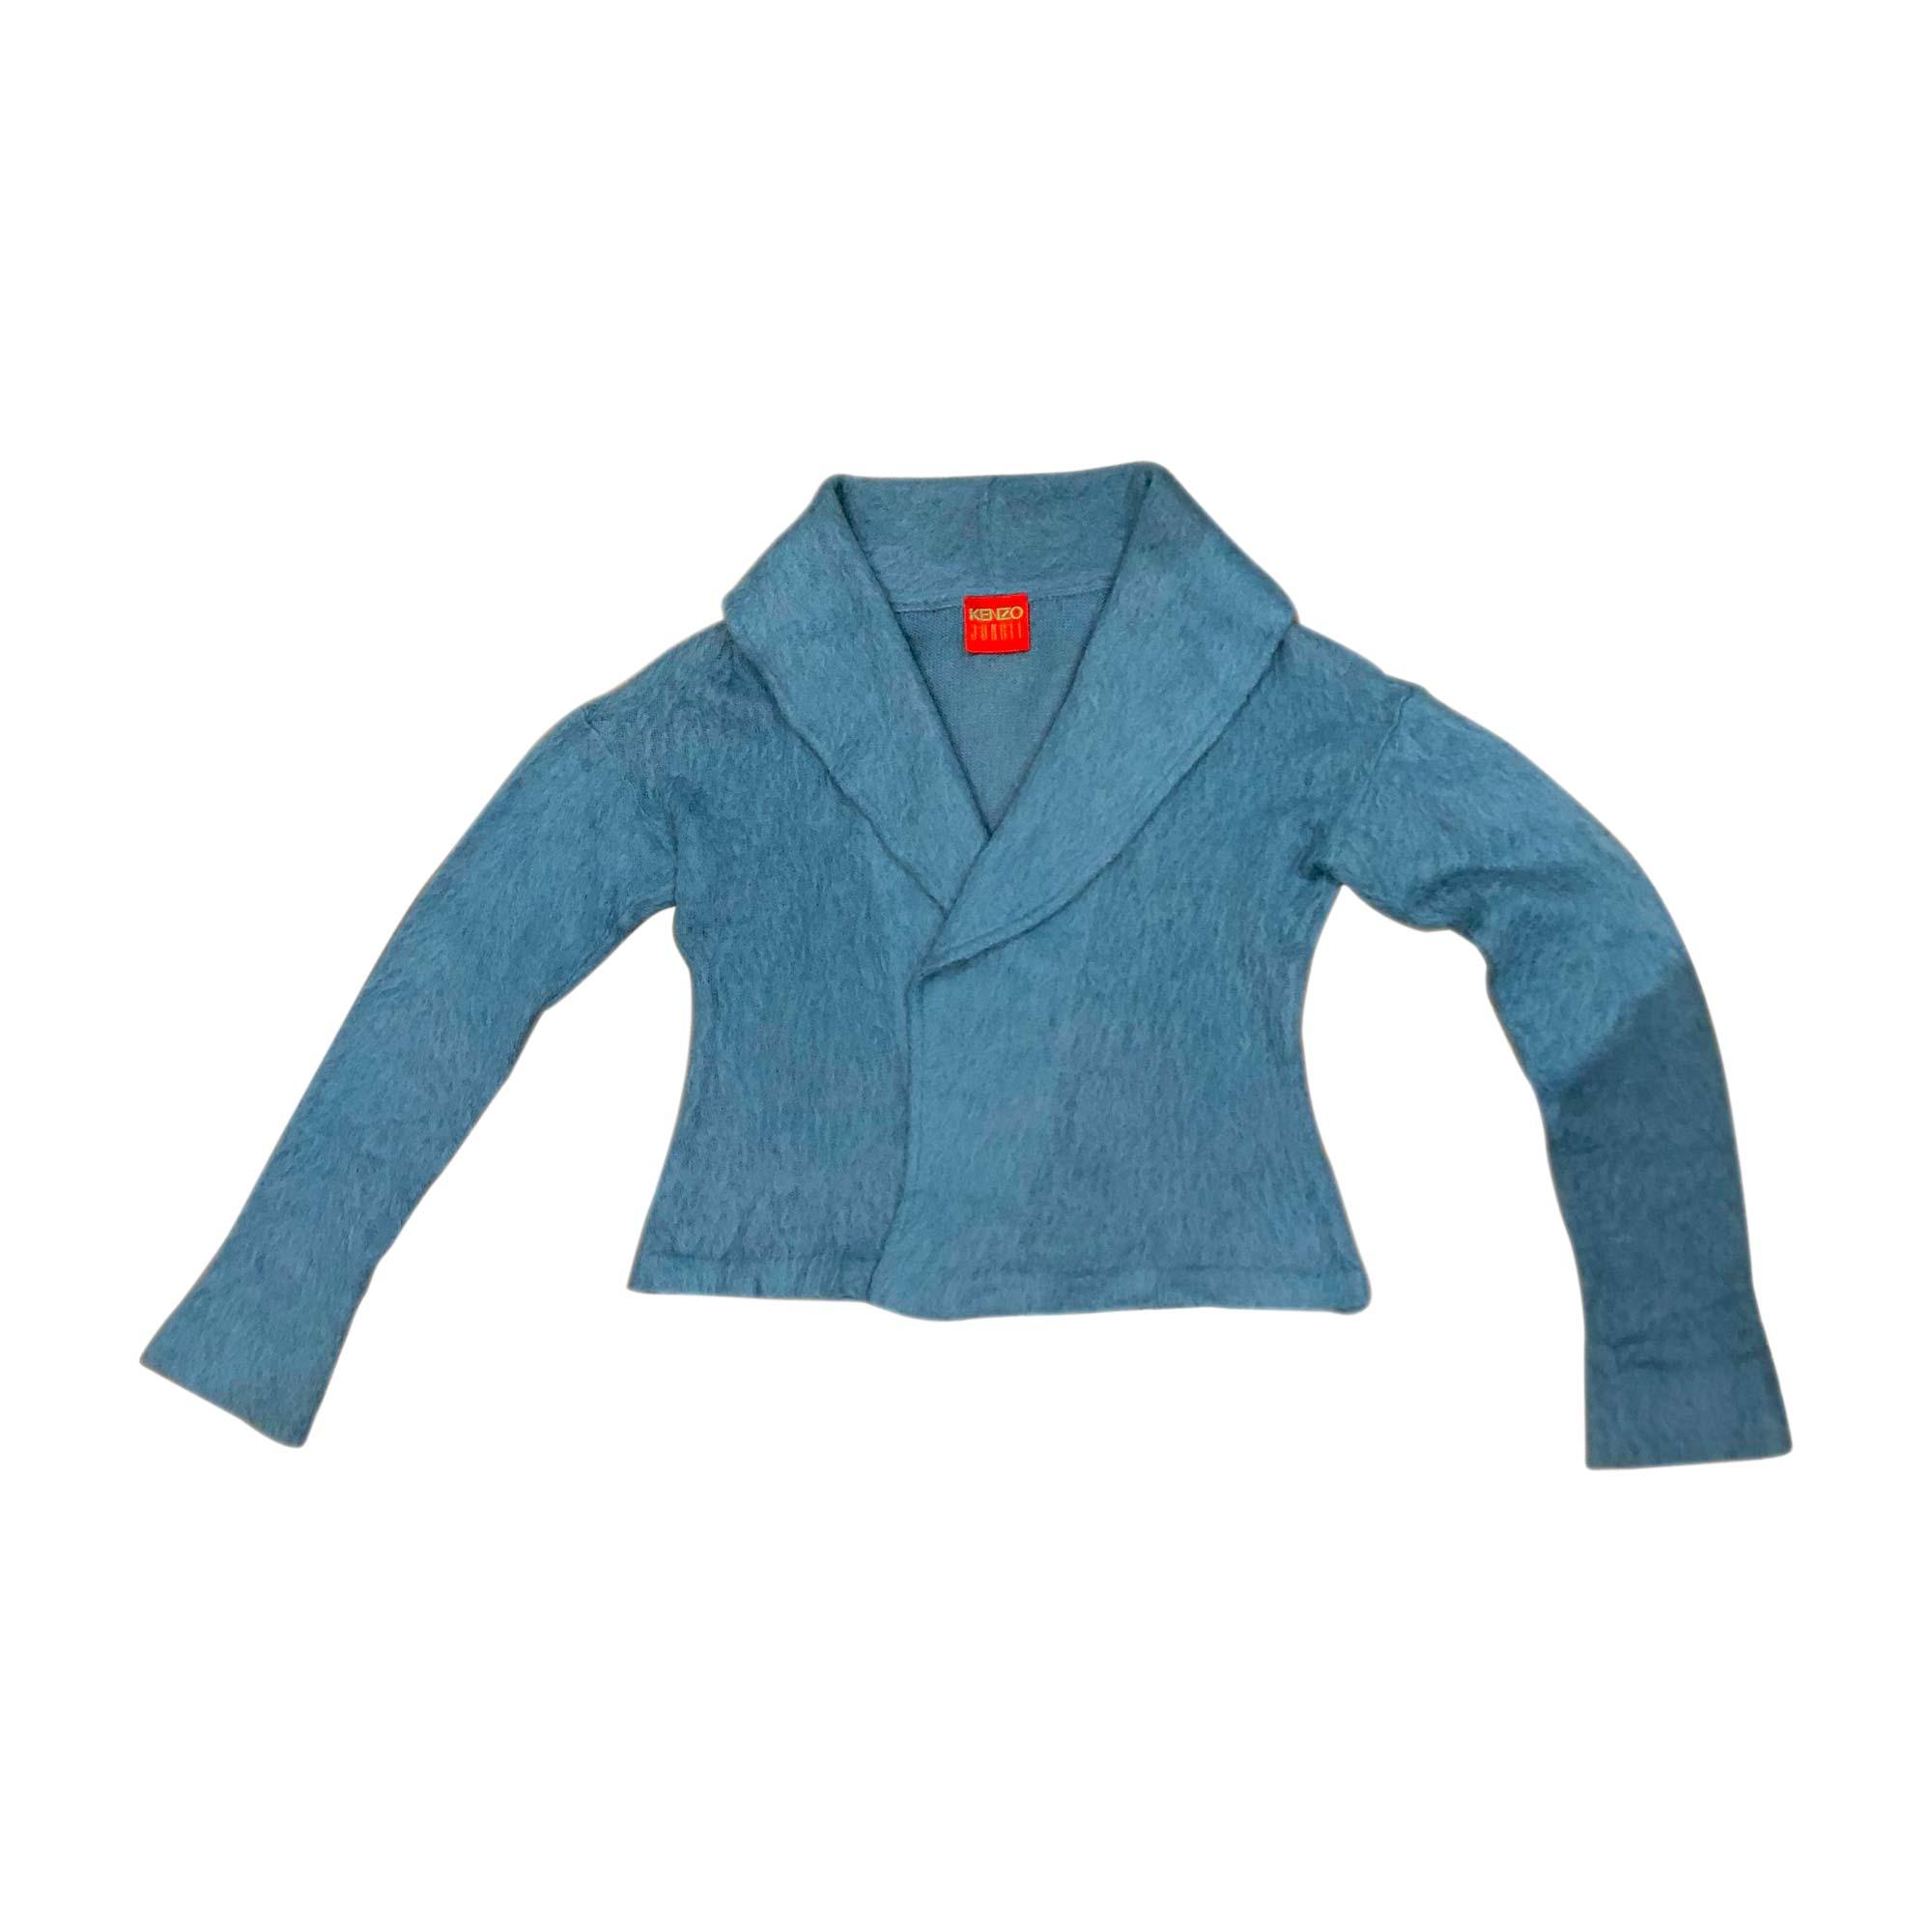 Gilet, cardigan KENZO Bleu, bleu marine, bleu turquoise